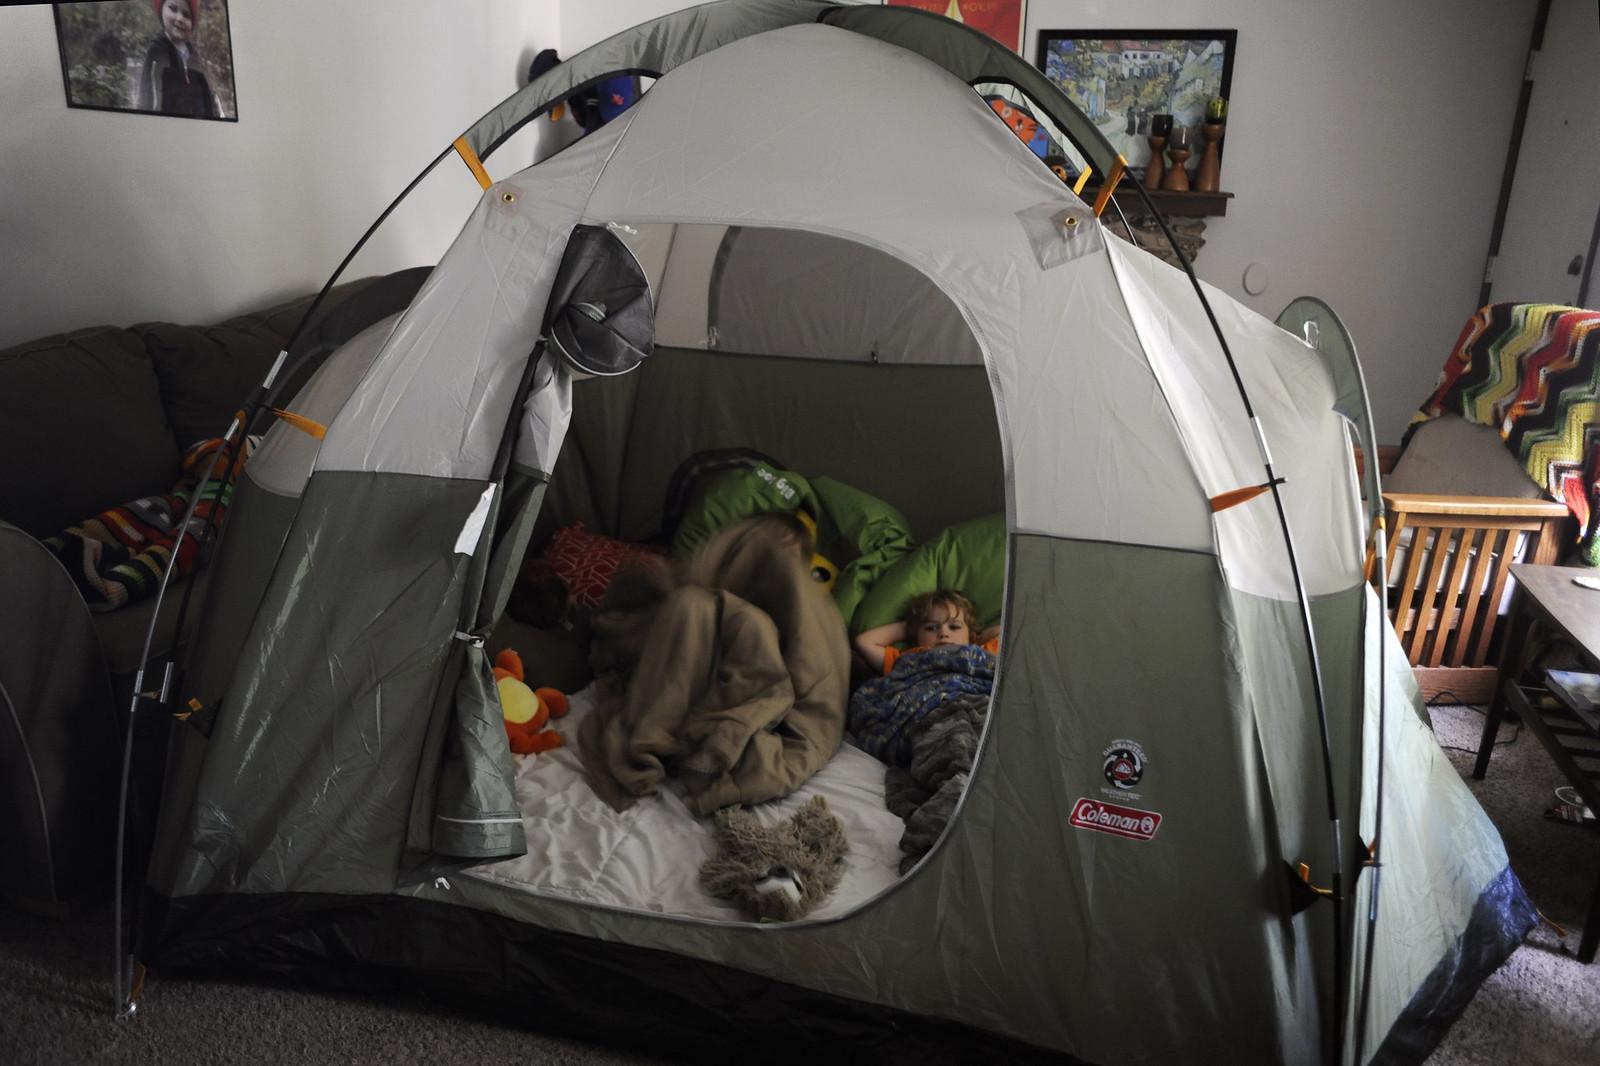 Urban camping.